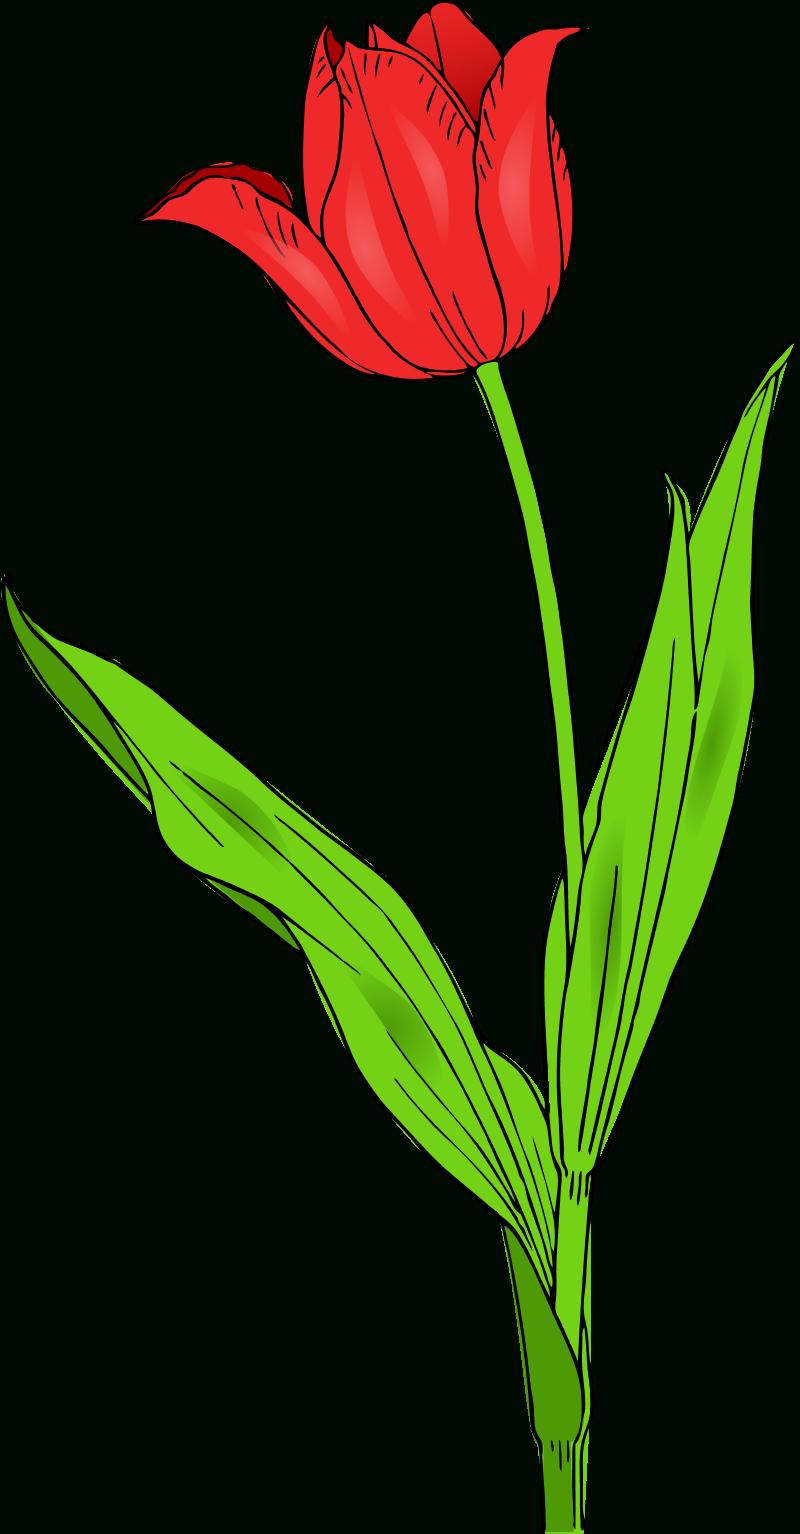 Spring Flowers Clip Art Free Printable 3 - Cliparting - Free Printable Clipart Of Flowers